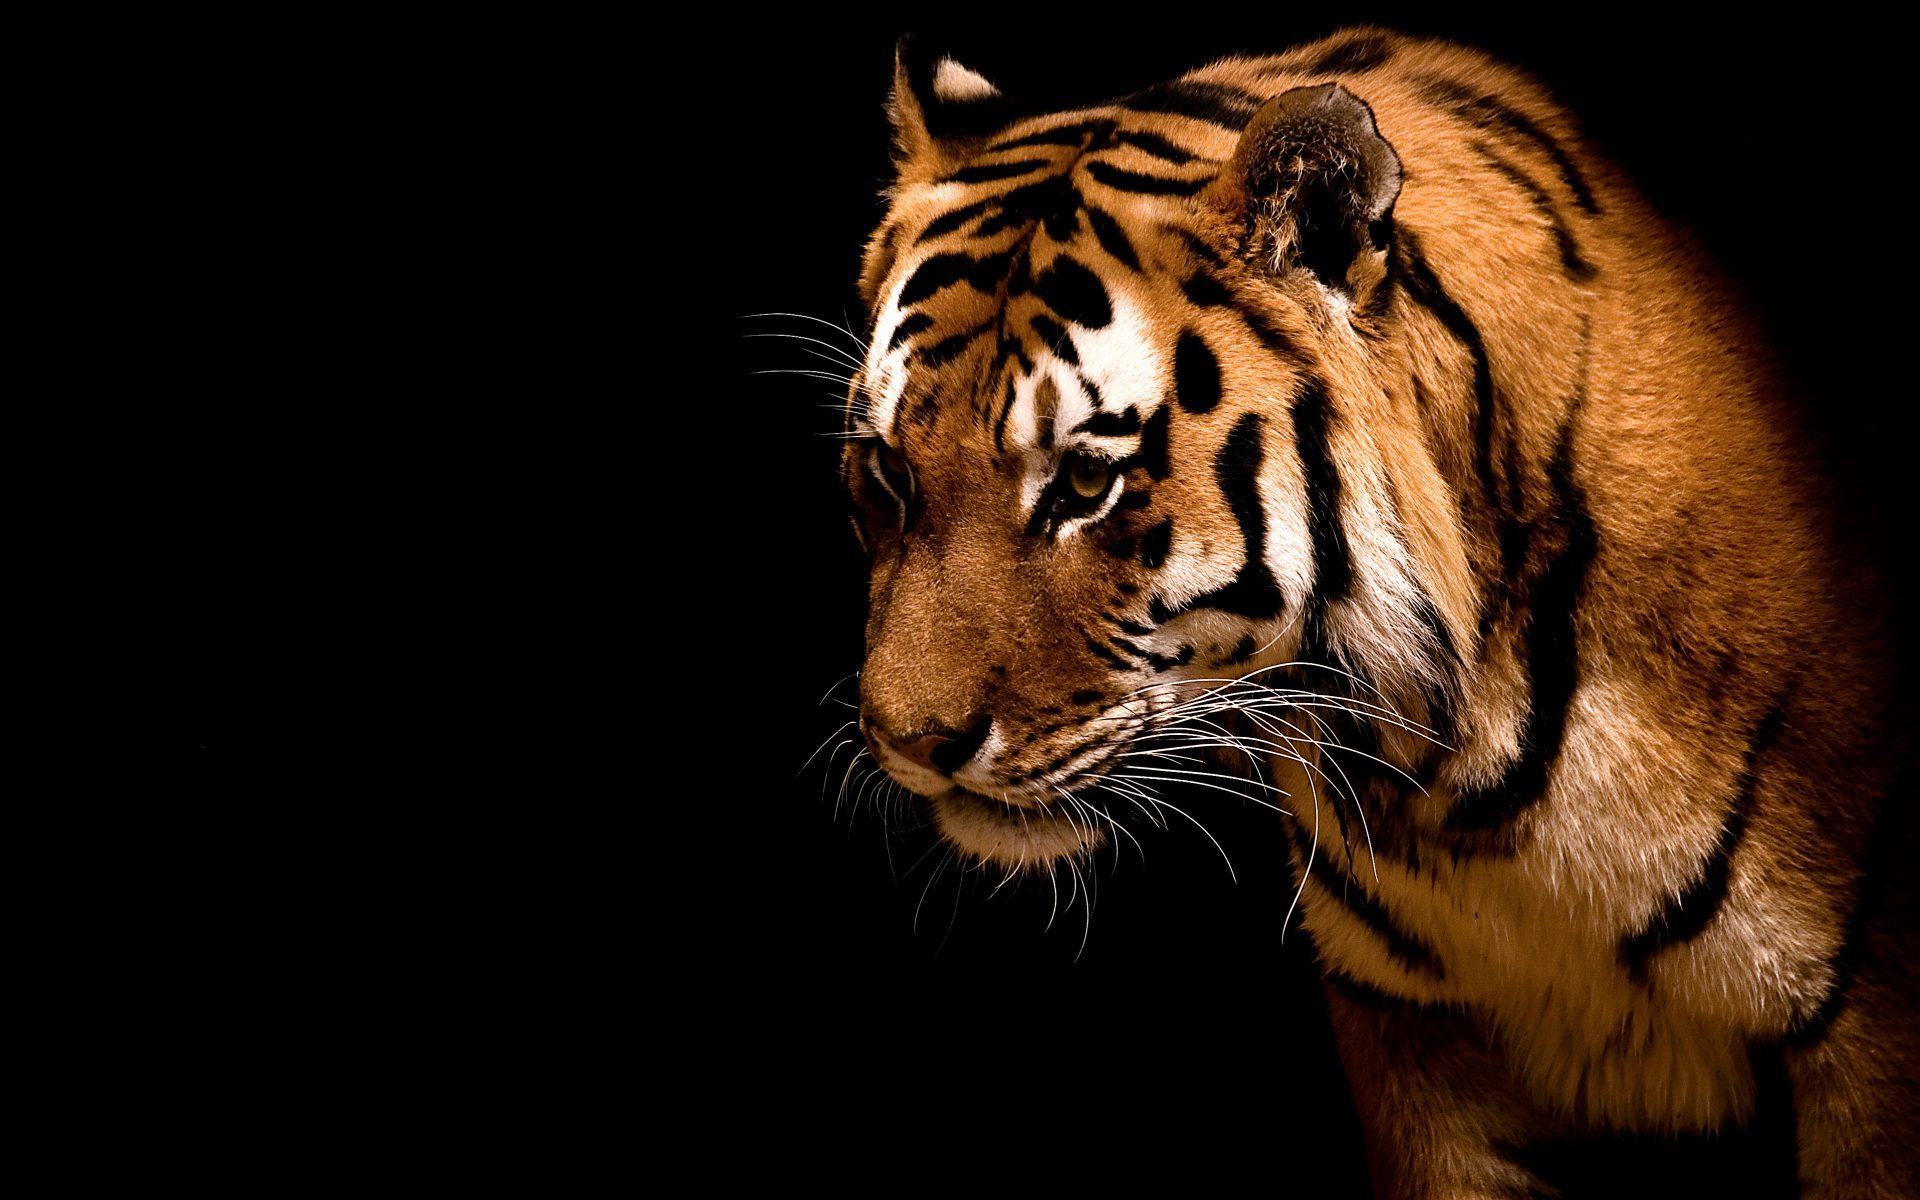 Download Sad tiger on black background High quality wallpaper 1920x1200